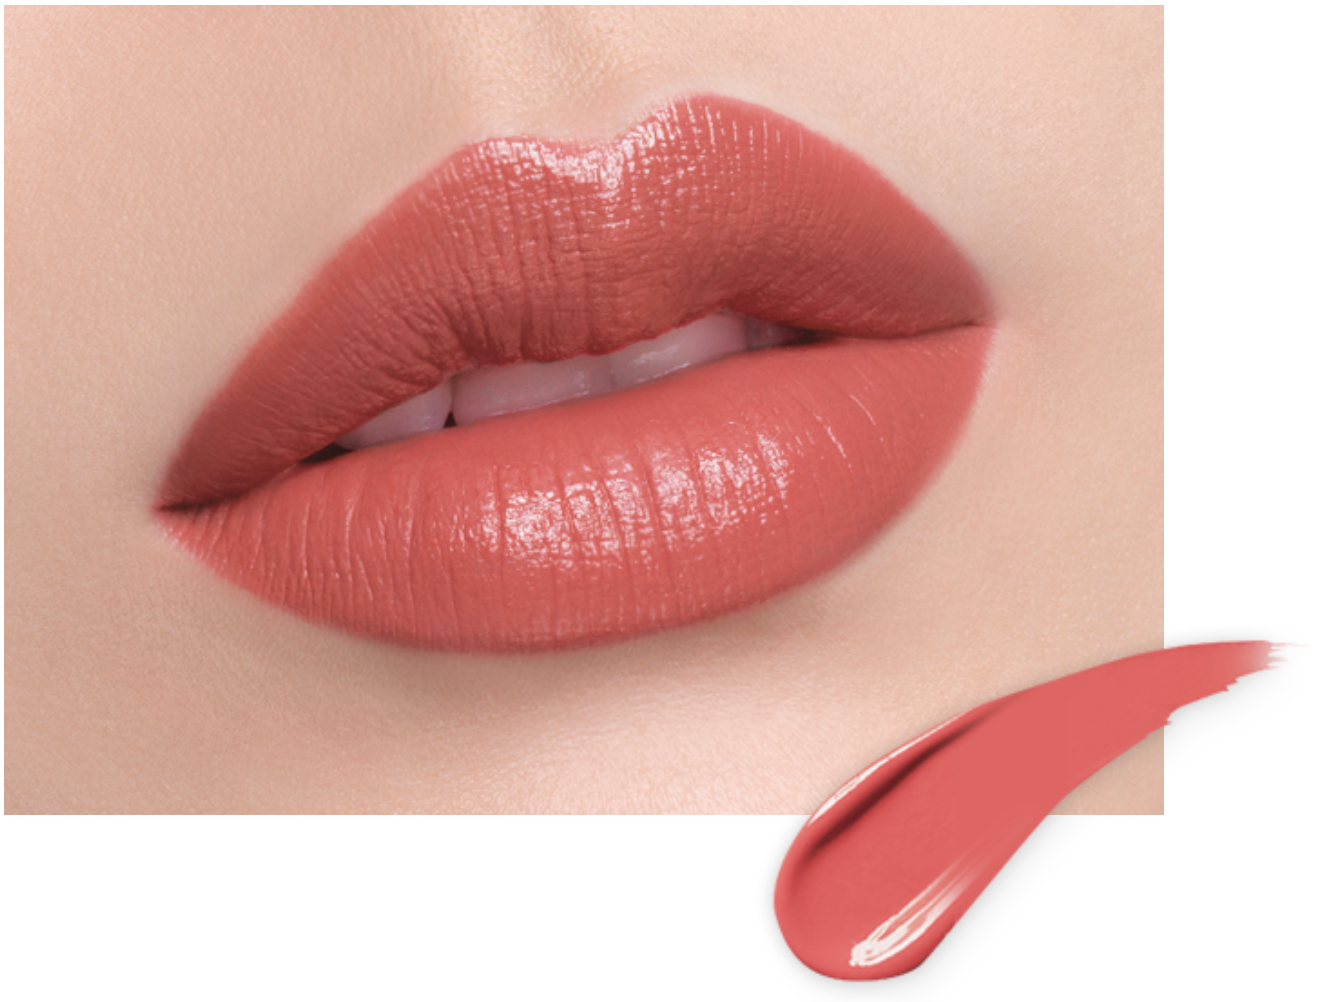 laneige-silk-intense-lipstick-014.png